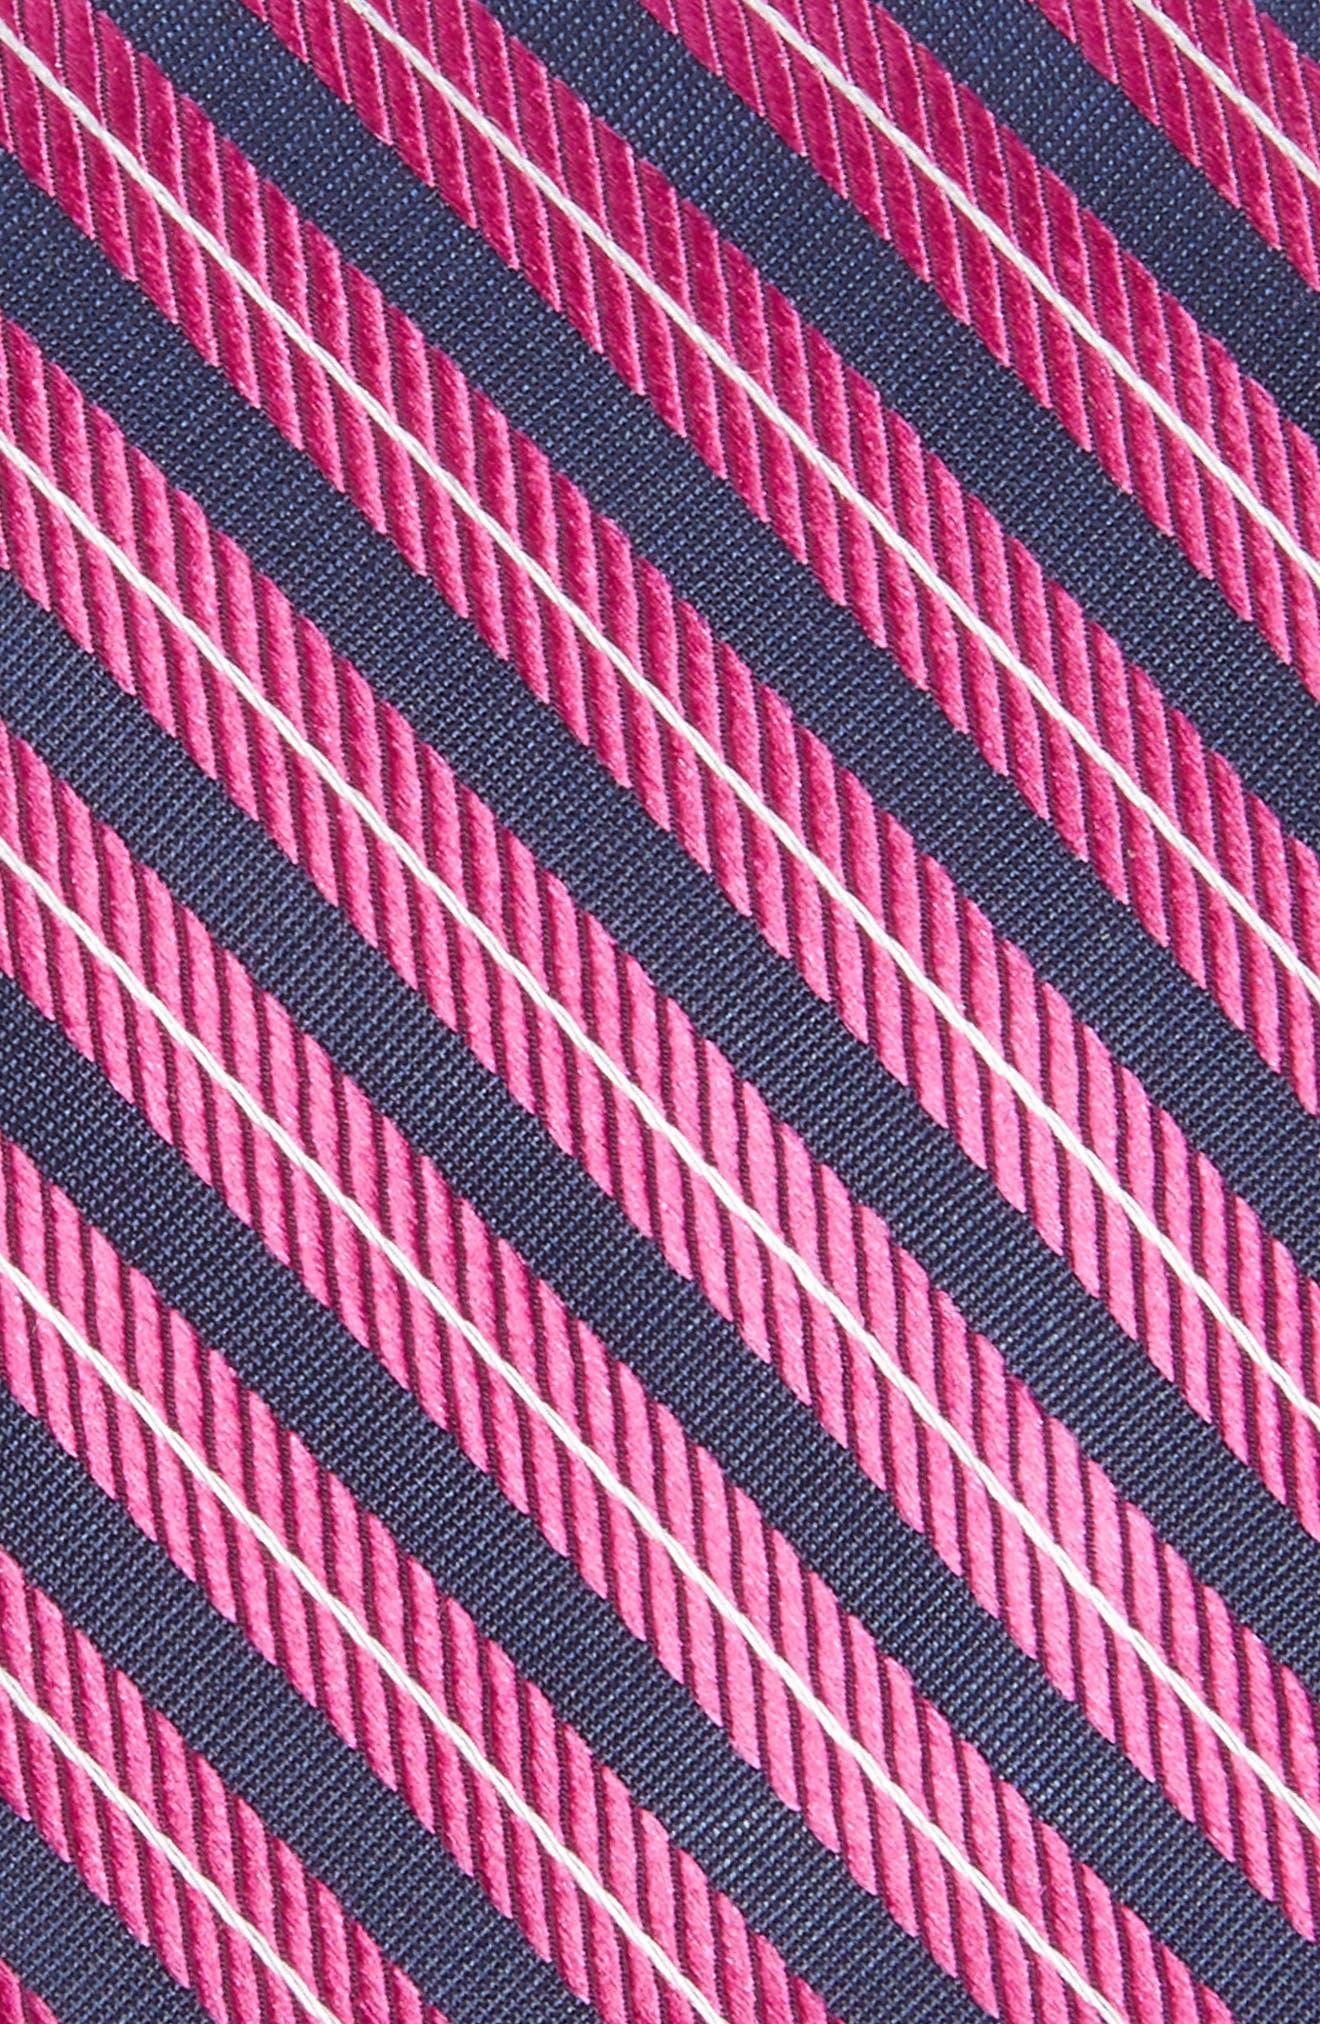 Milliner Stripe Silk Tie,                             Alternate thumbnail 6, color,